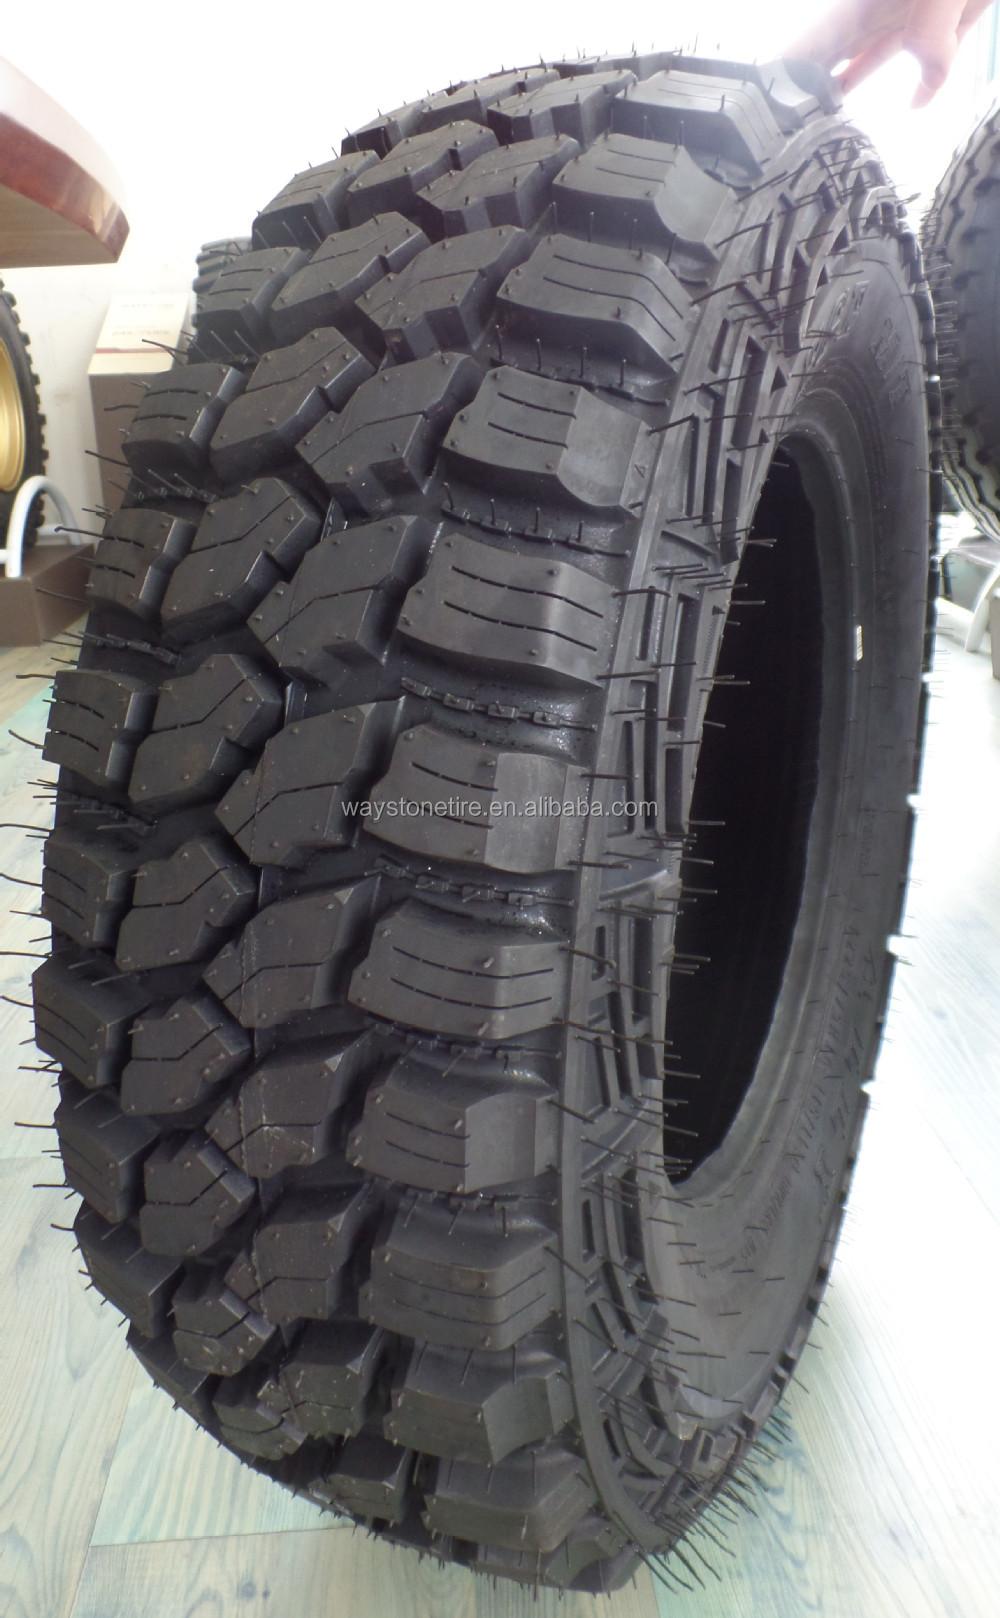 4x4 Off Road >> Waystone Mud Tire Lt285/75r16,33/12.5-15 Mud Terrain Tire ...